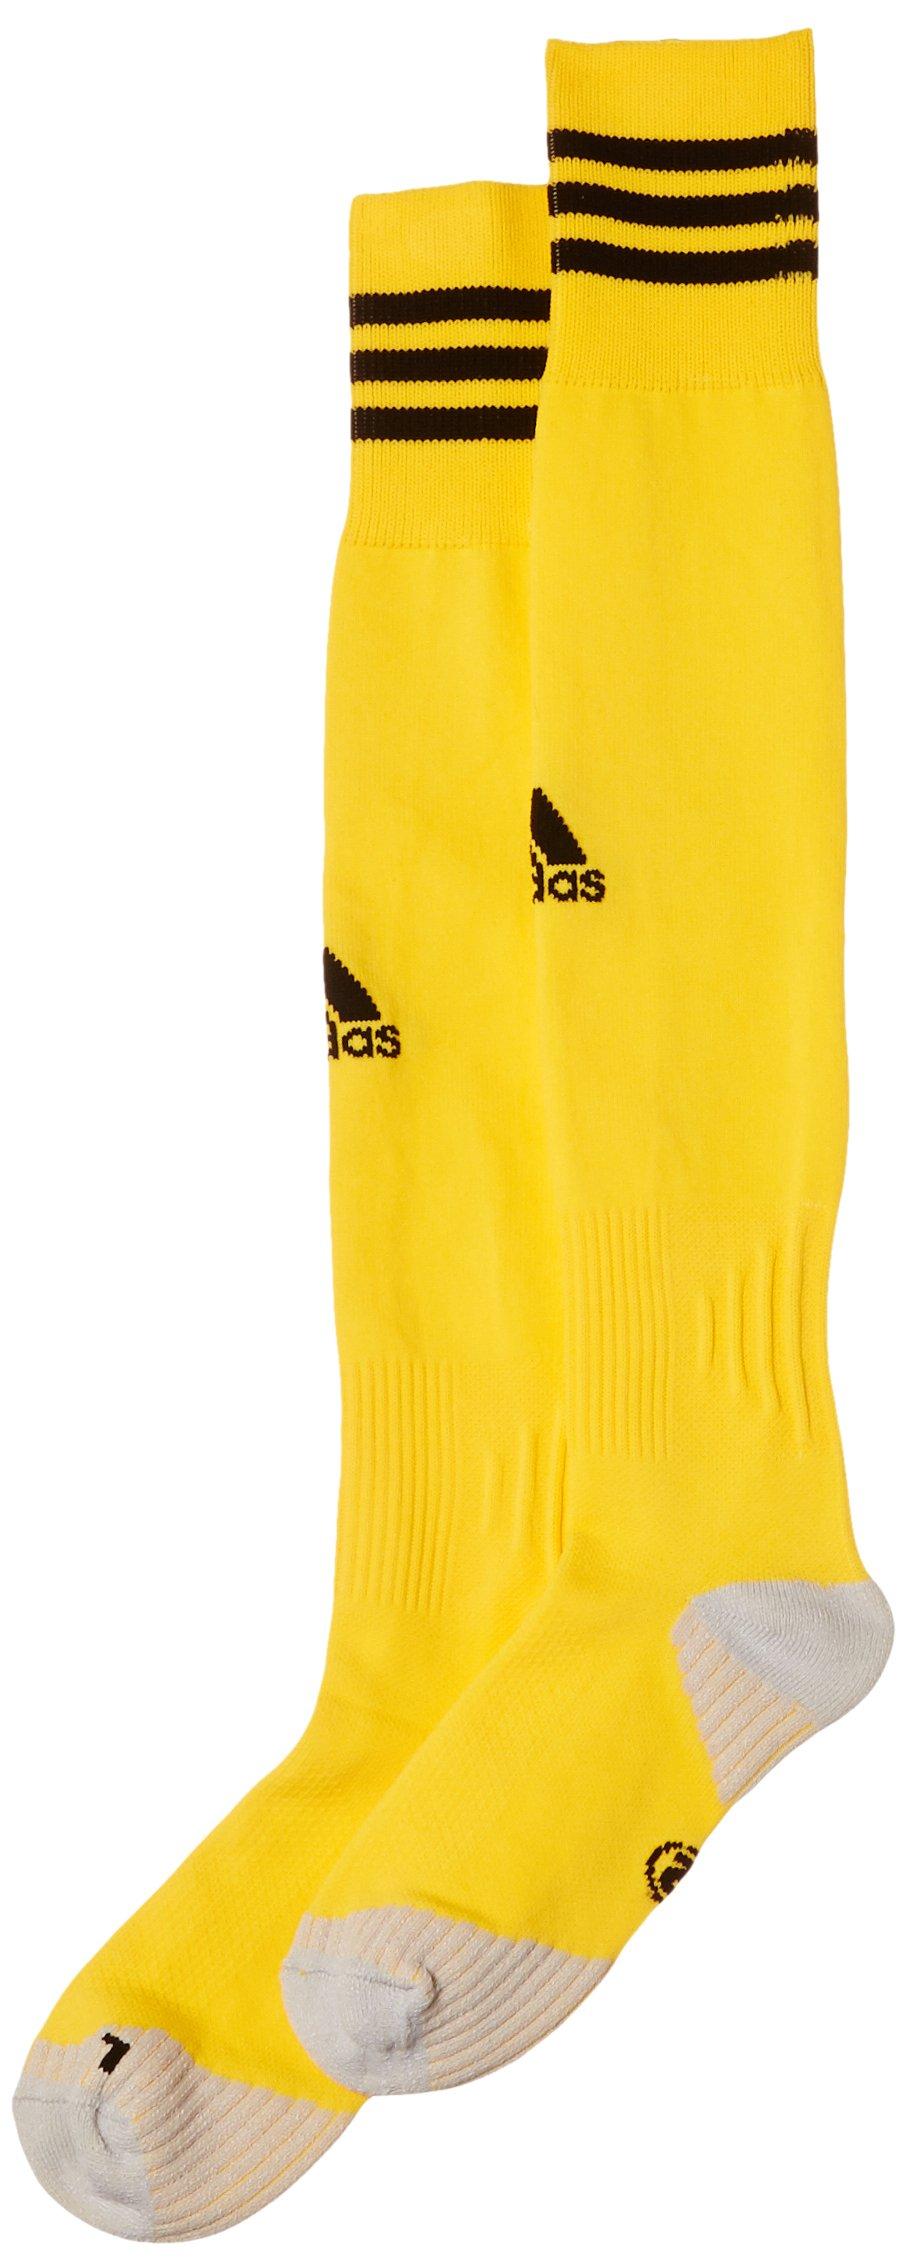 Adidas Adisock 12 Calzini, Oro (Dorado/Nero), 3